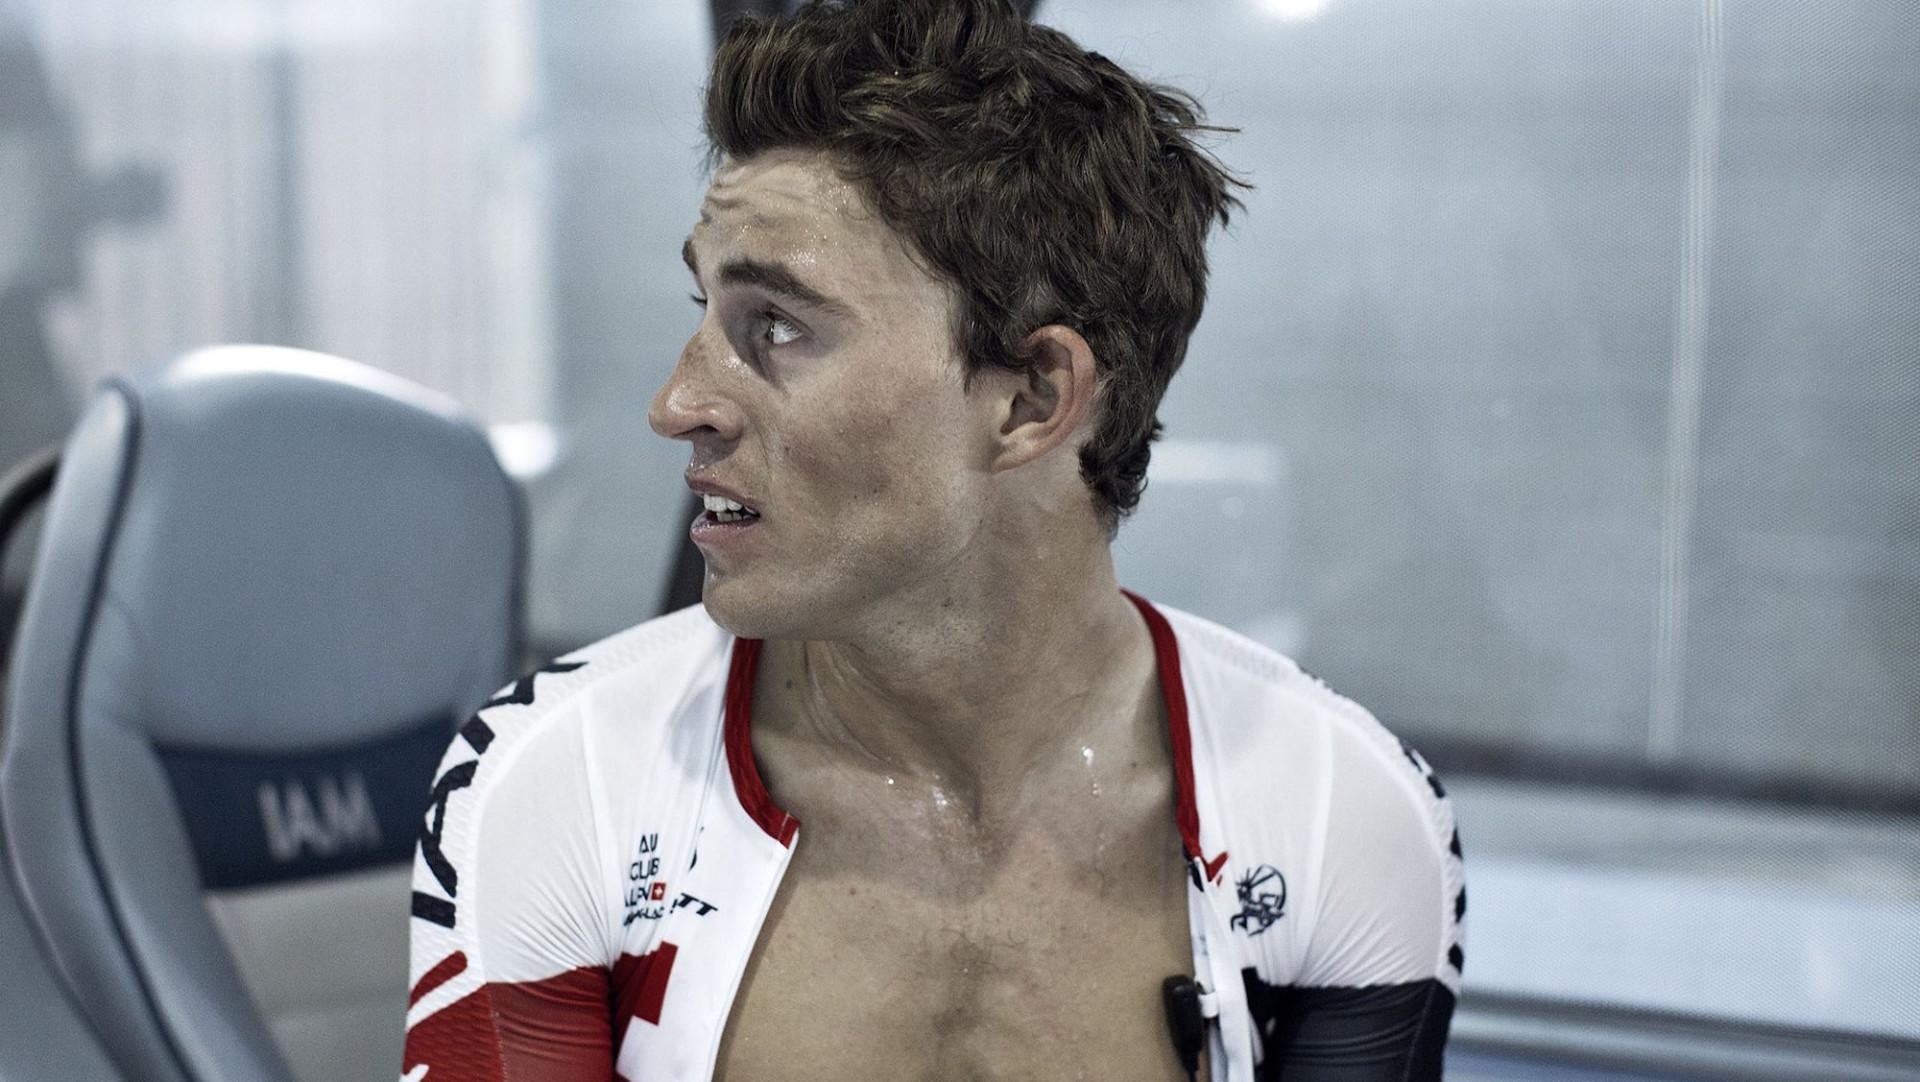 EuroEyes Cyclassics – La frustration domine chez IAM Cycling